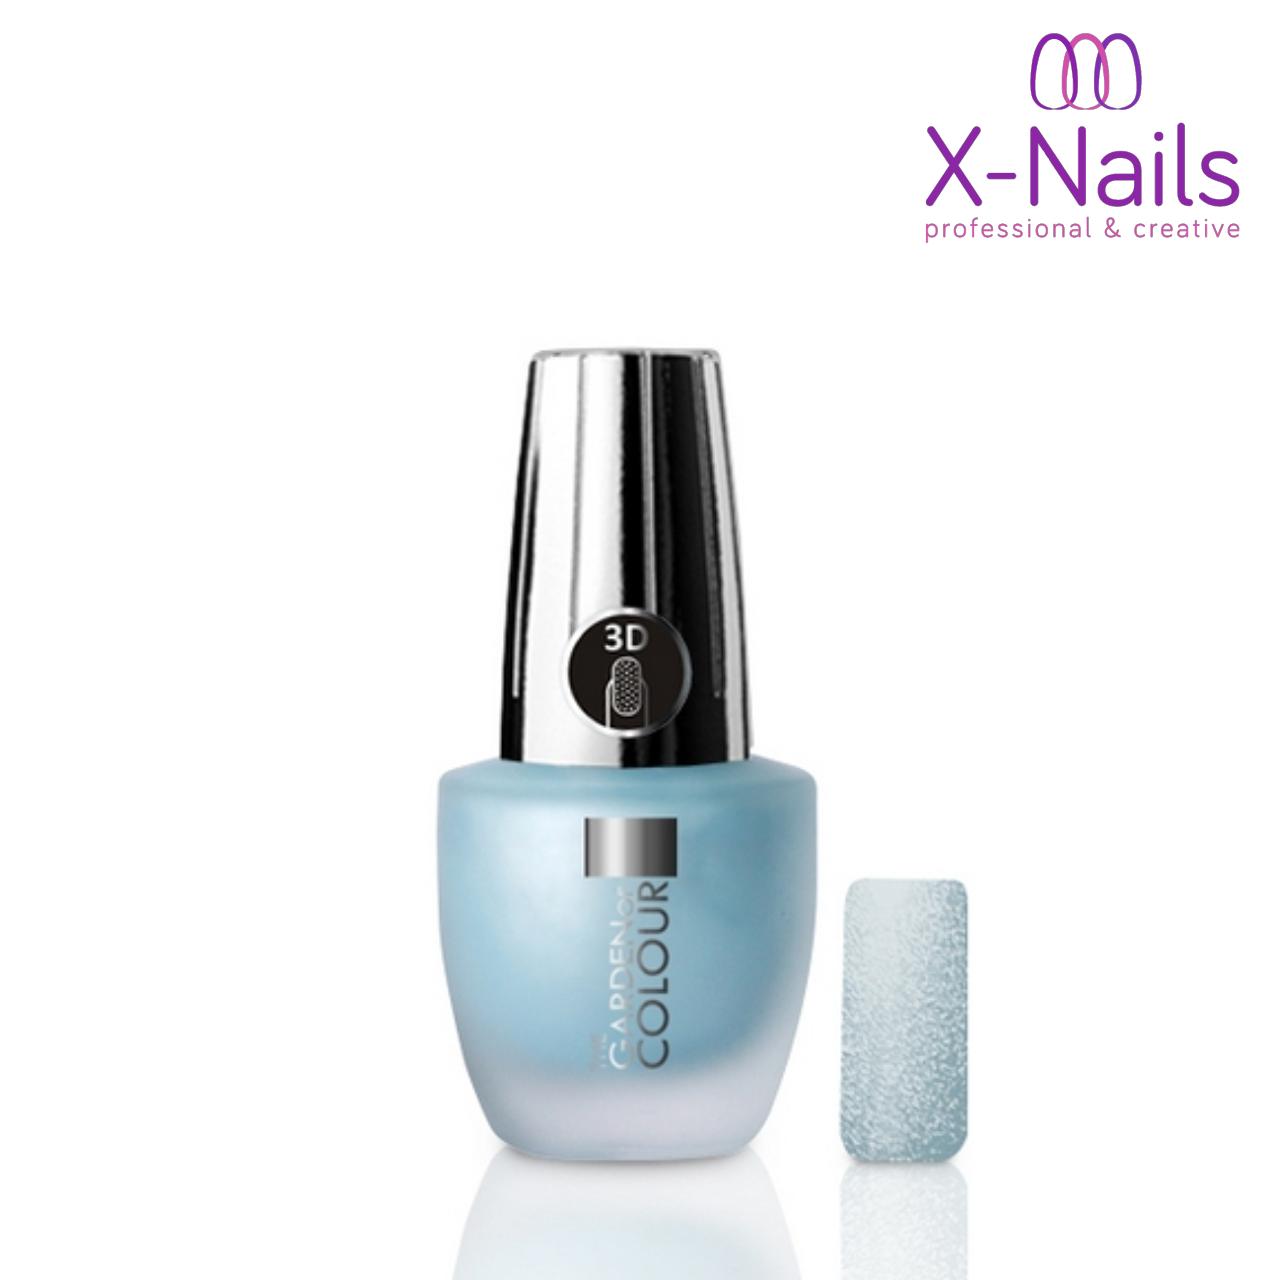 X Nails Lak Na Nehty 3d Piskovy Efekt 117 Sandy In Light Blue